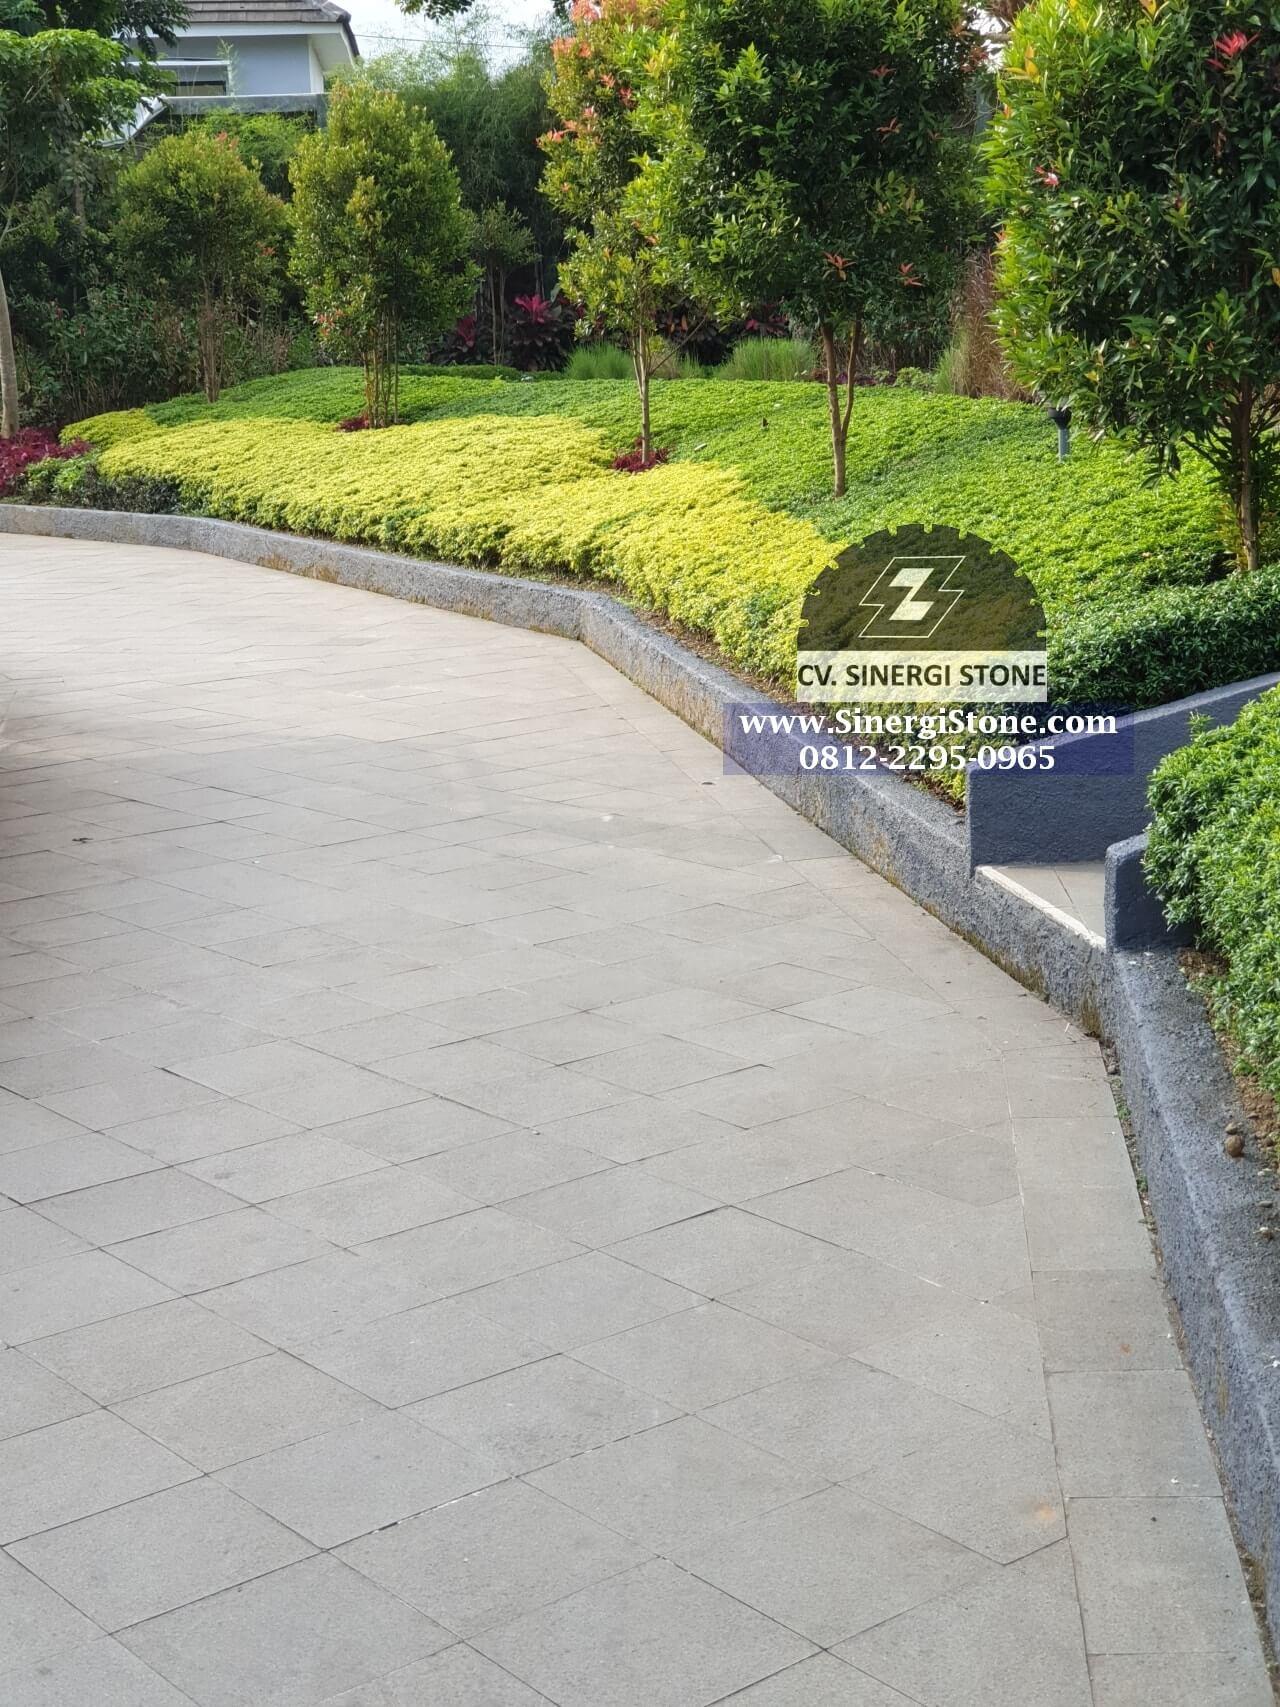 Contoh aplikasi batu andesit bakar untuk pedestrian (lokasi The Village Purwokerto)